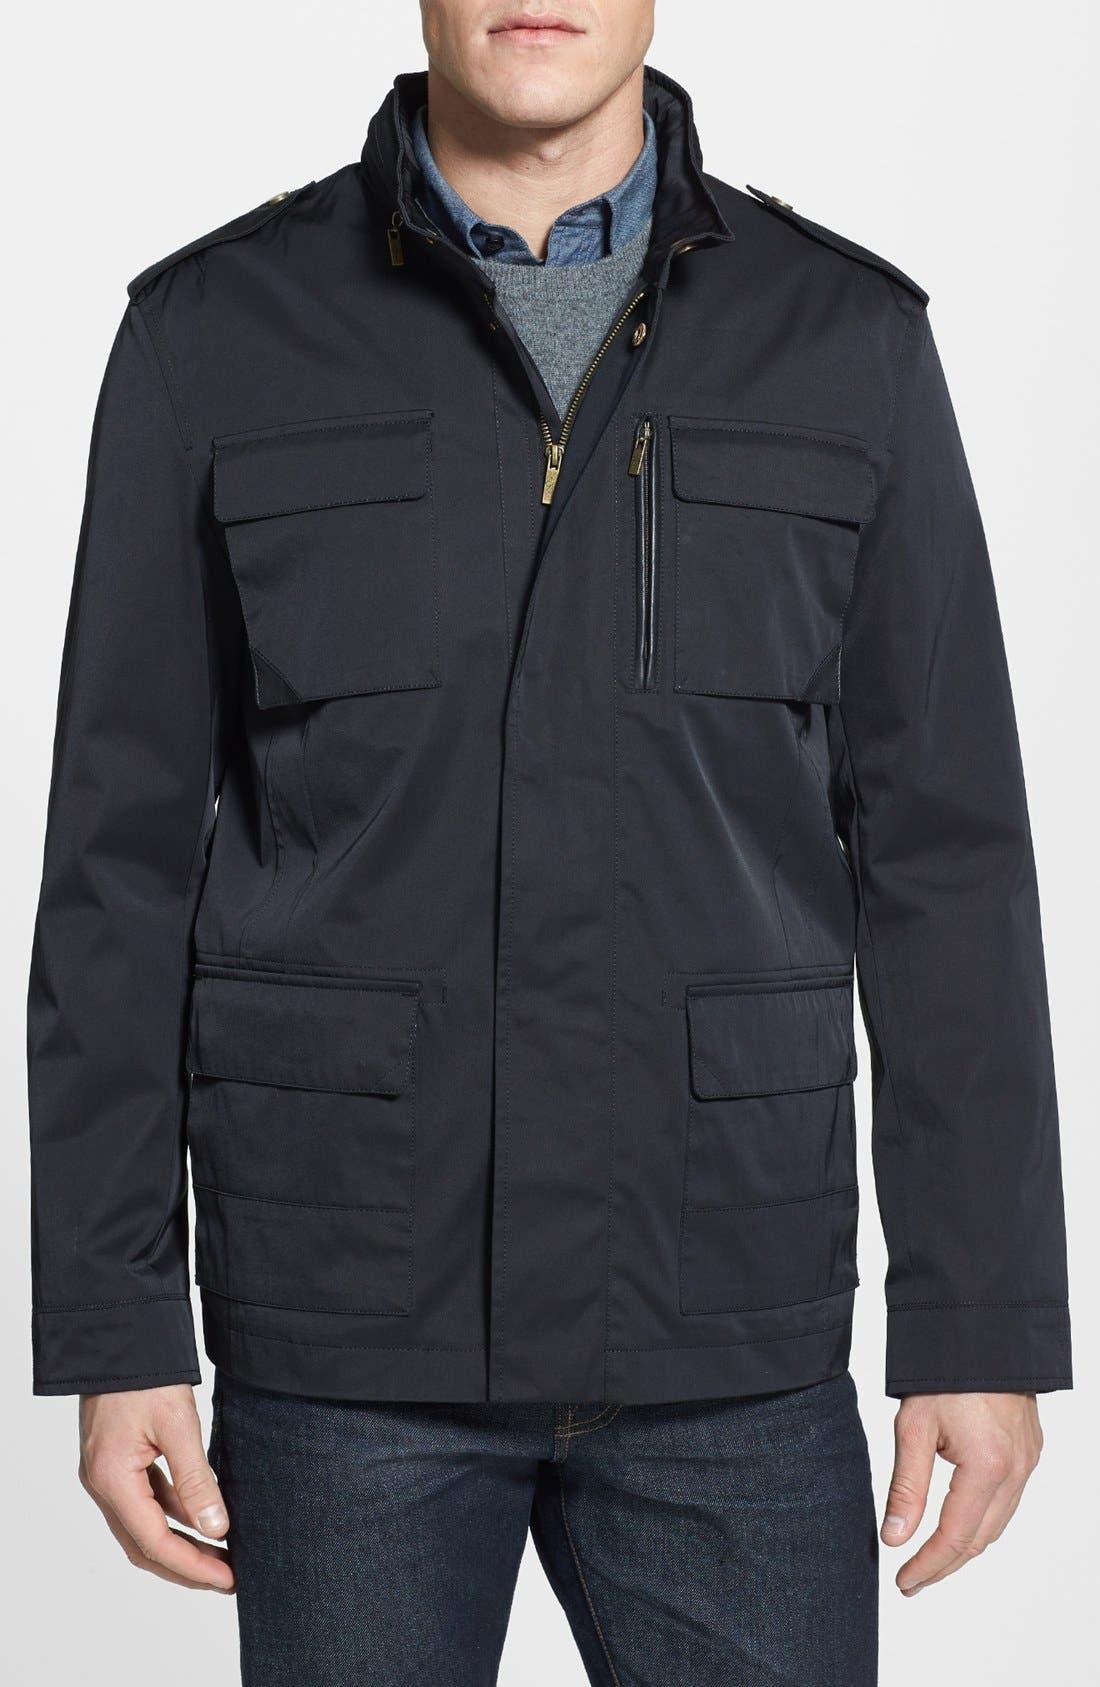 Alternate Image 1 Selected - Cole Haan Water Resistant Coated Field Jacket